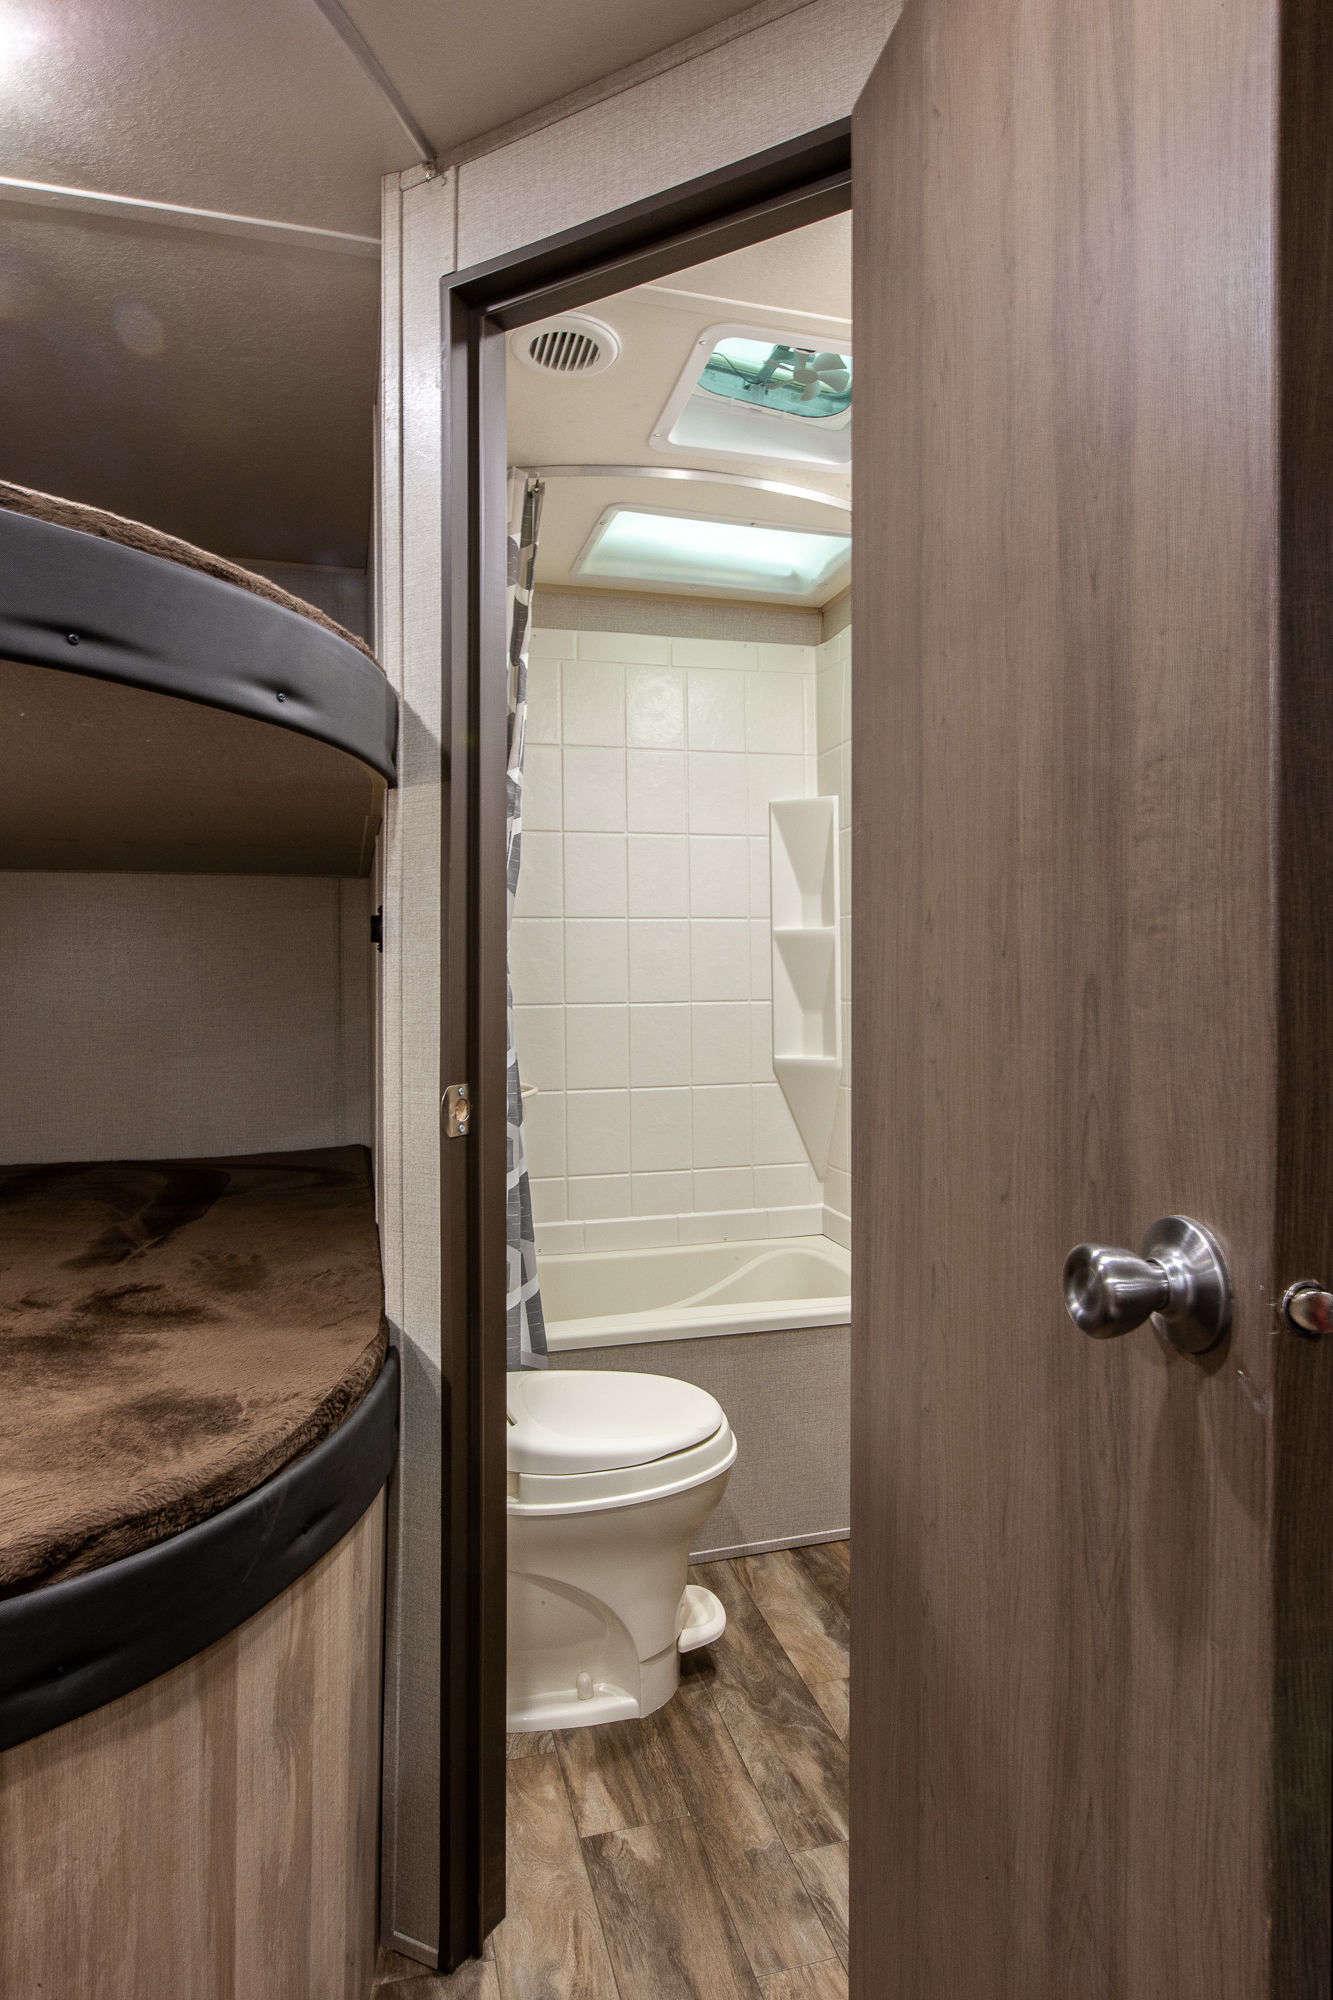 2020 Coachmen Catalina Summit Series 261BH Bunkhouse Travel Trailer Interior Image